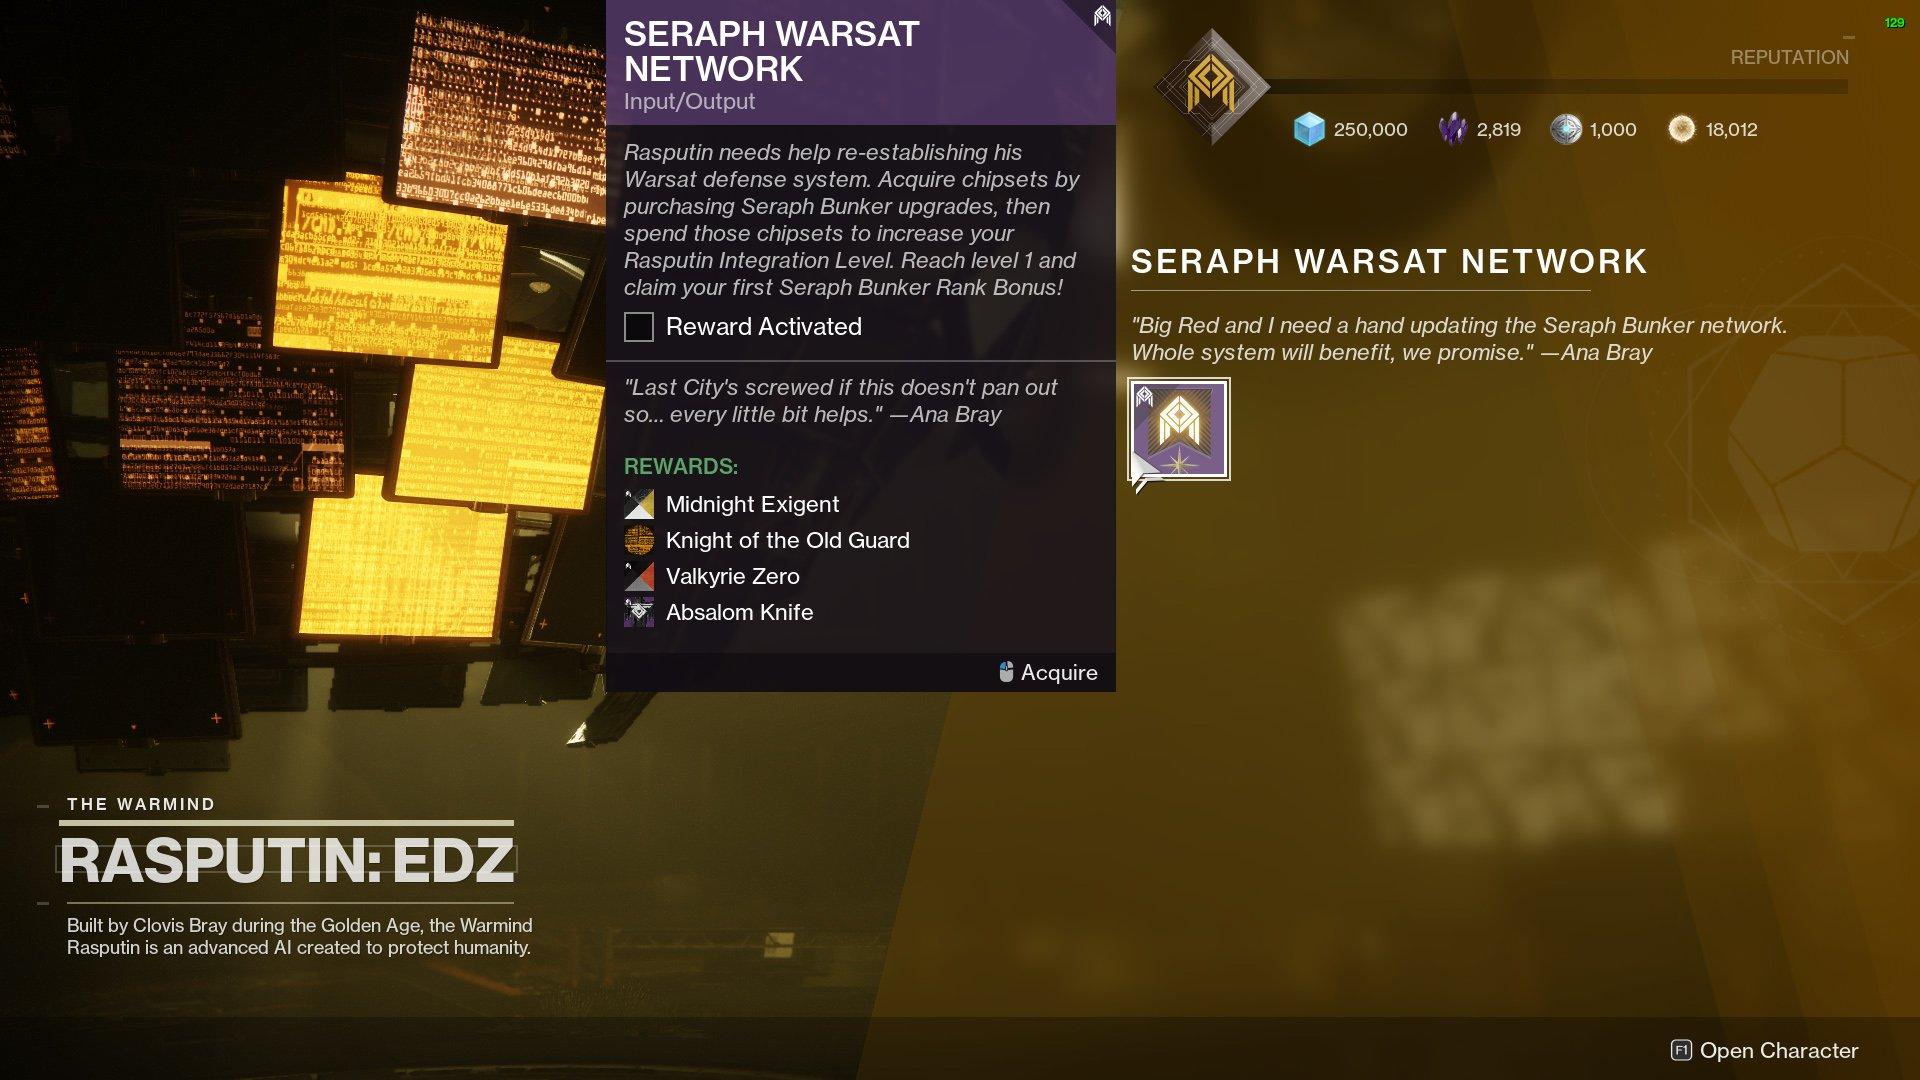 Destiny 2 Seraph Warsat Network quest